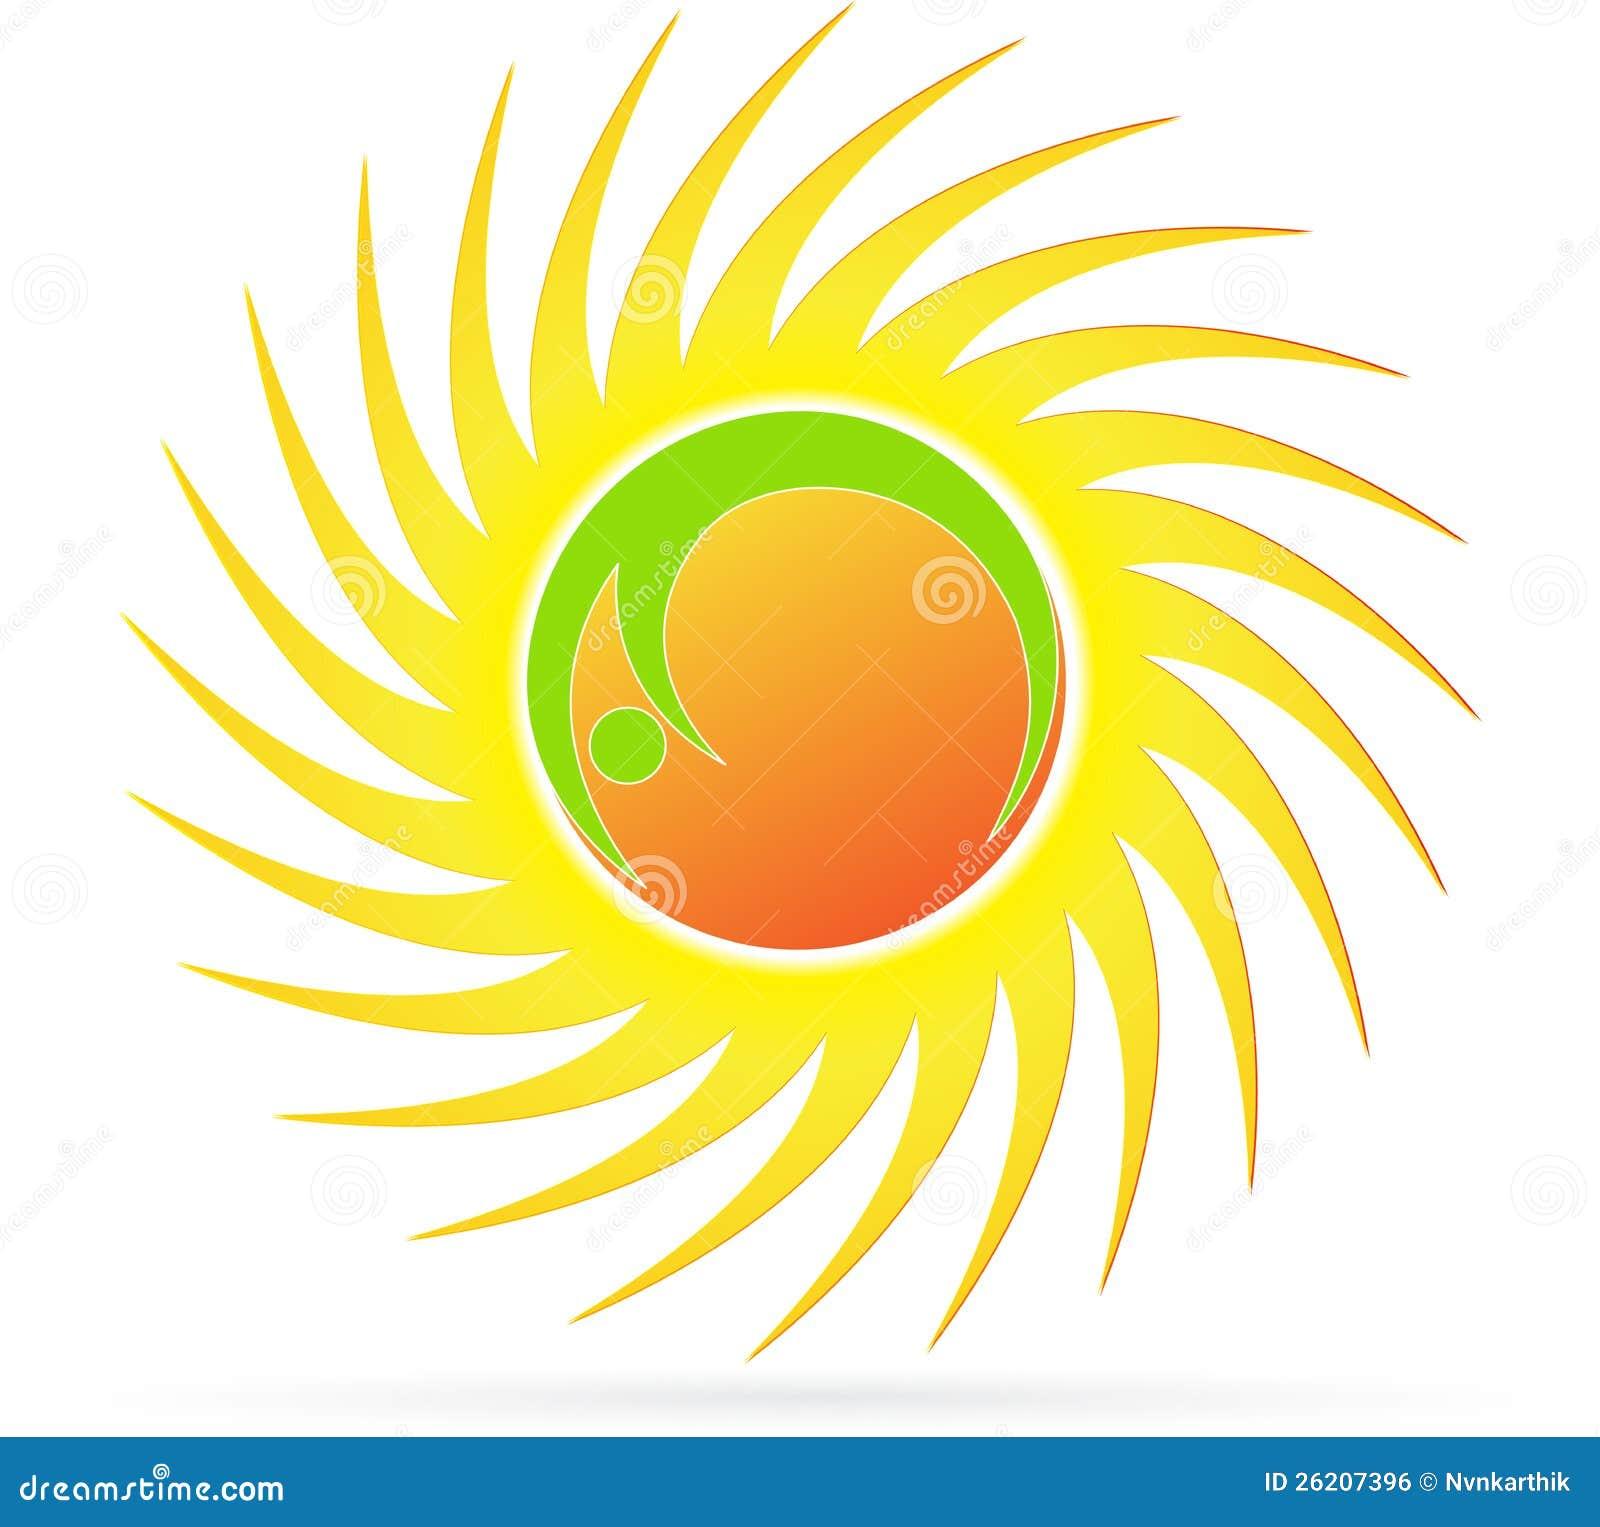 Illustration of sun logo design on white background.